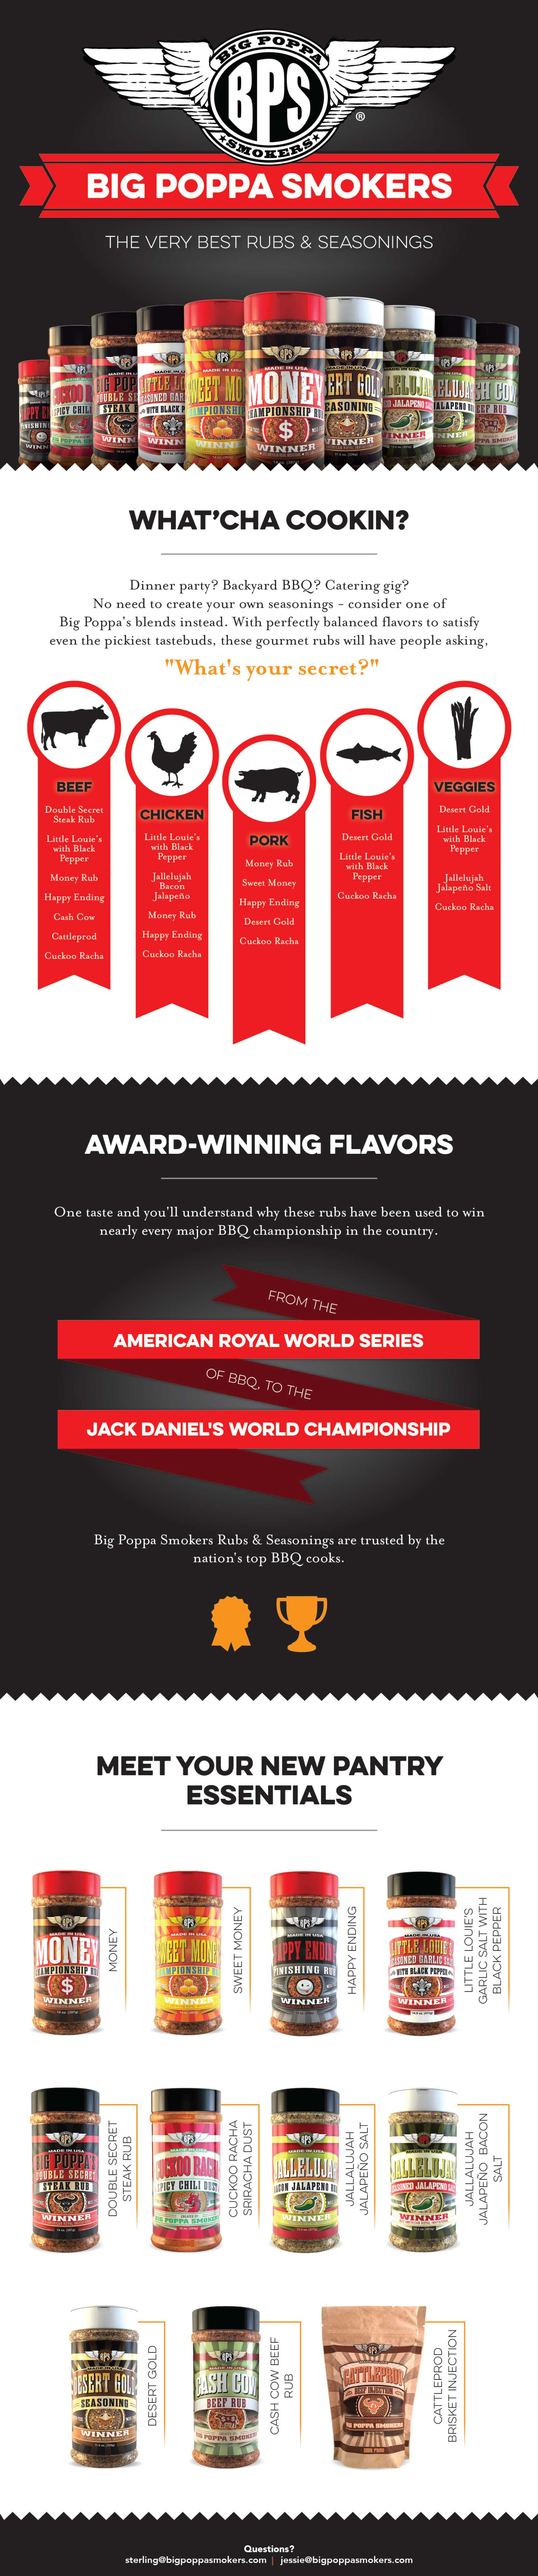 Big Poppa Smokers BBQ Rub Infographic